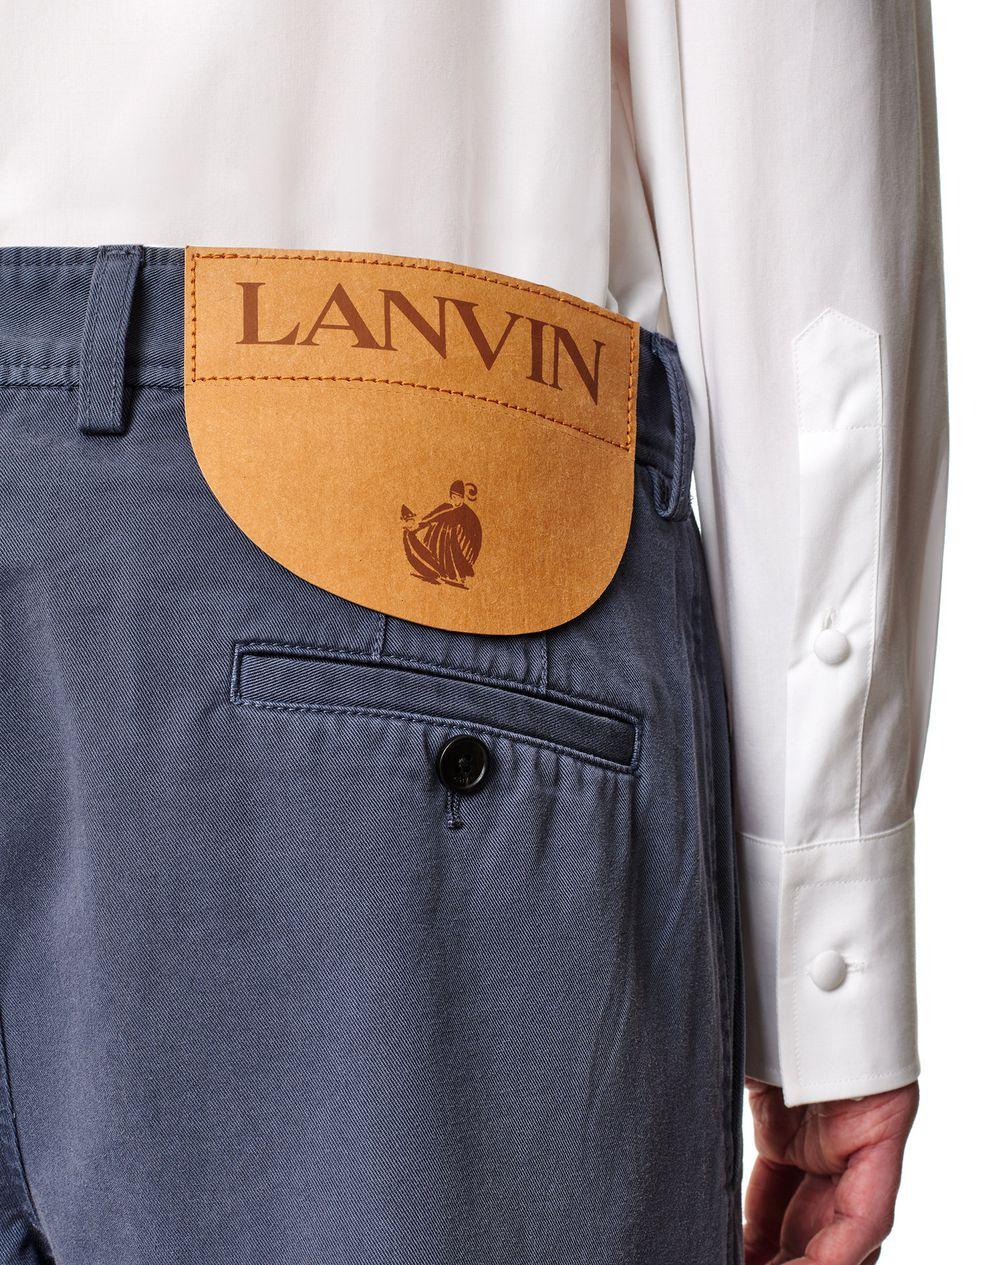 CHINO PANTS - Lanvin